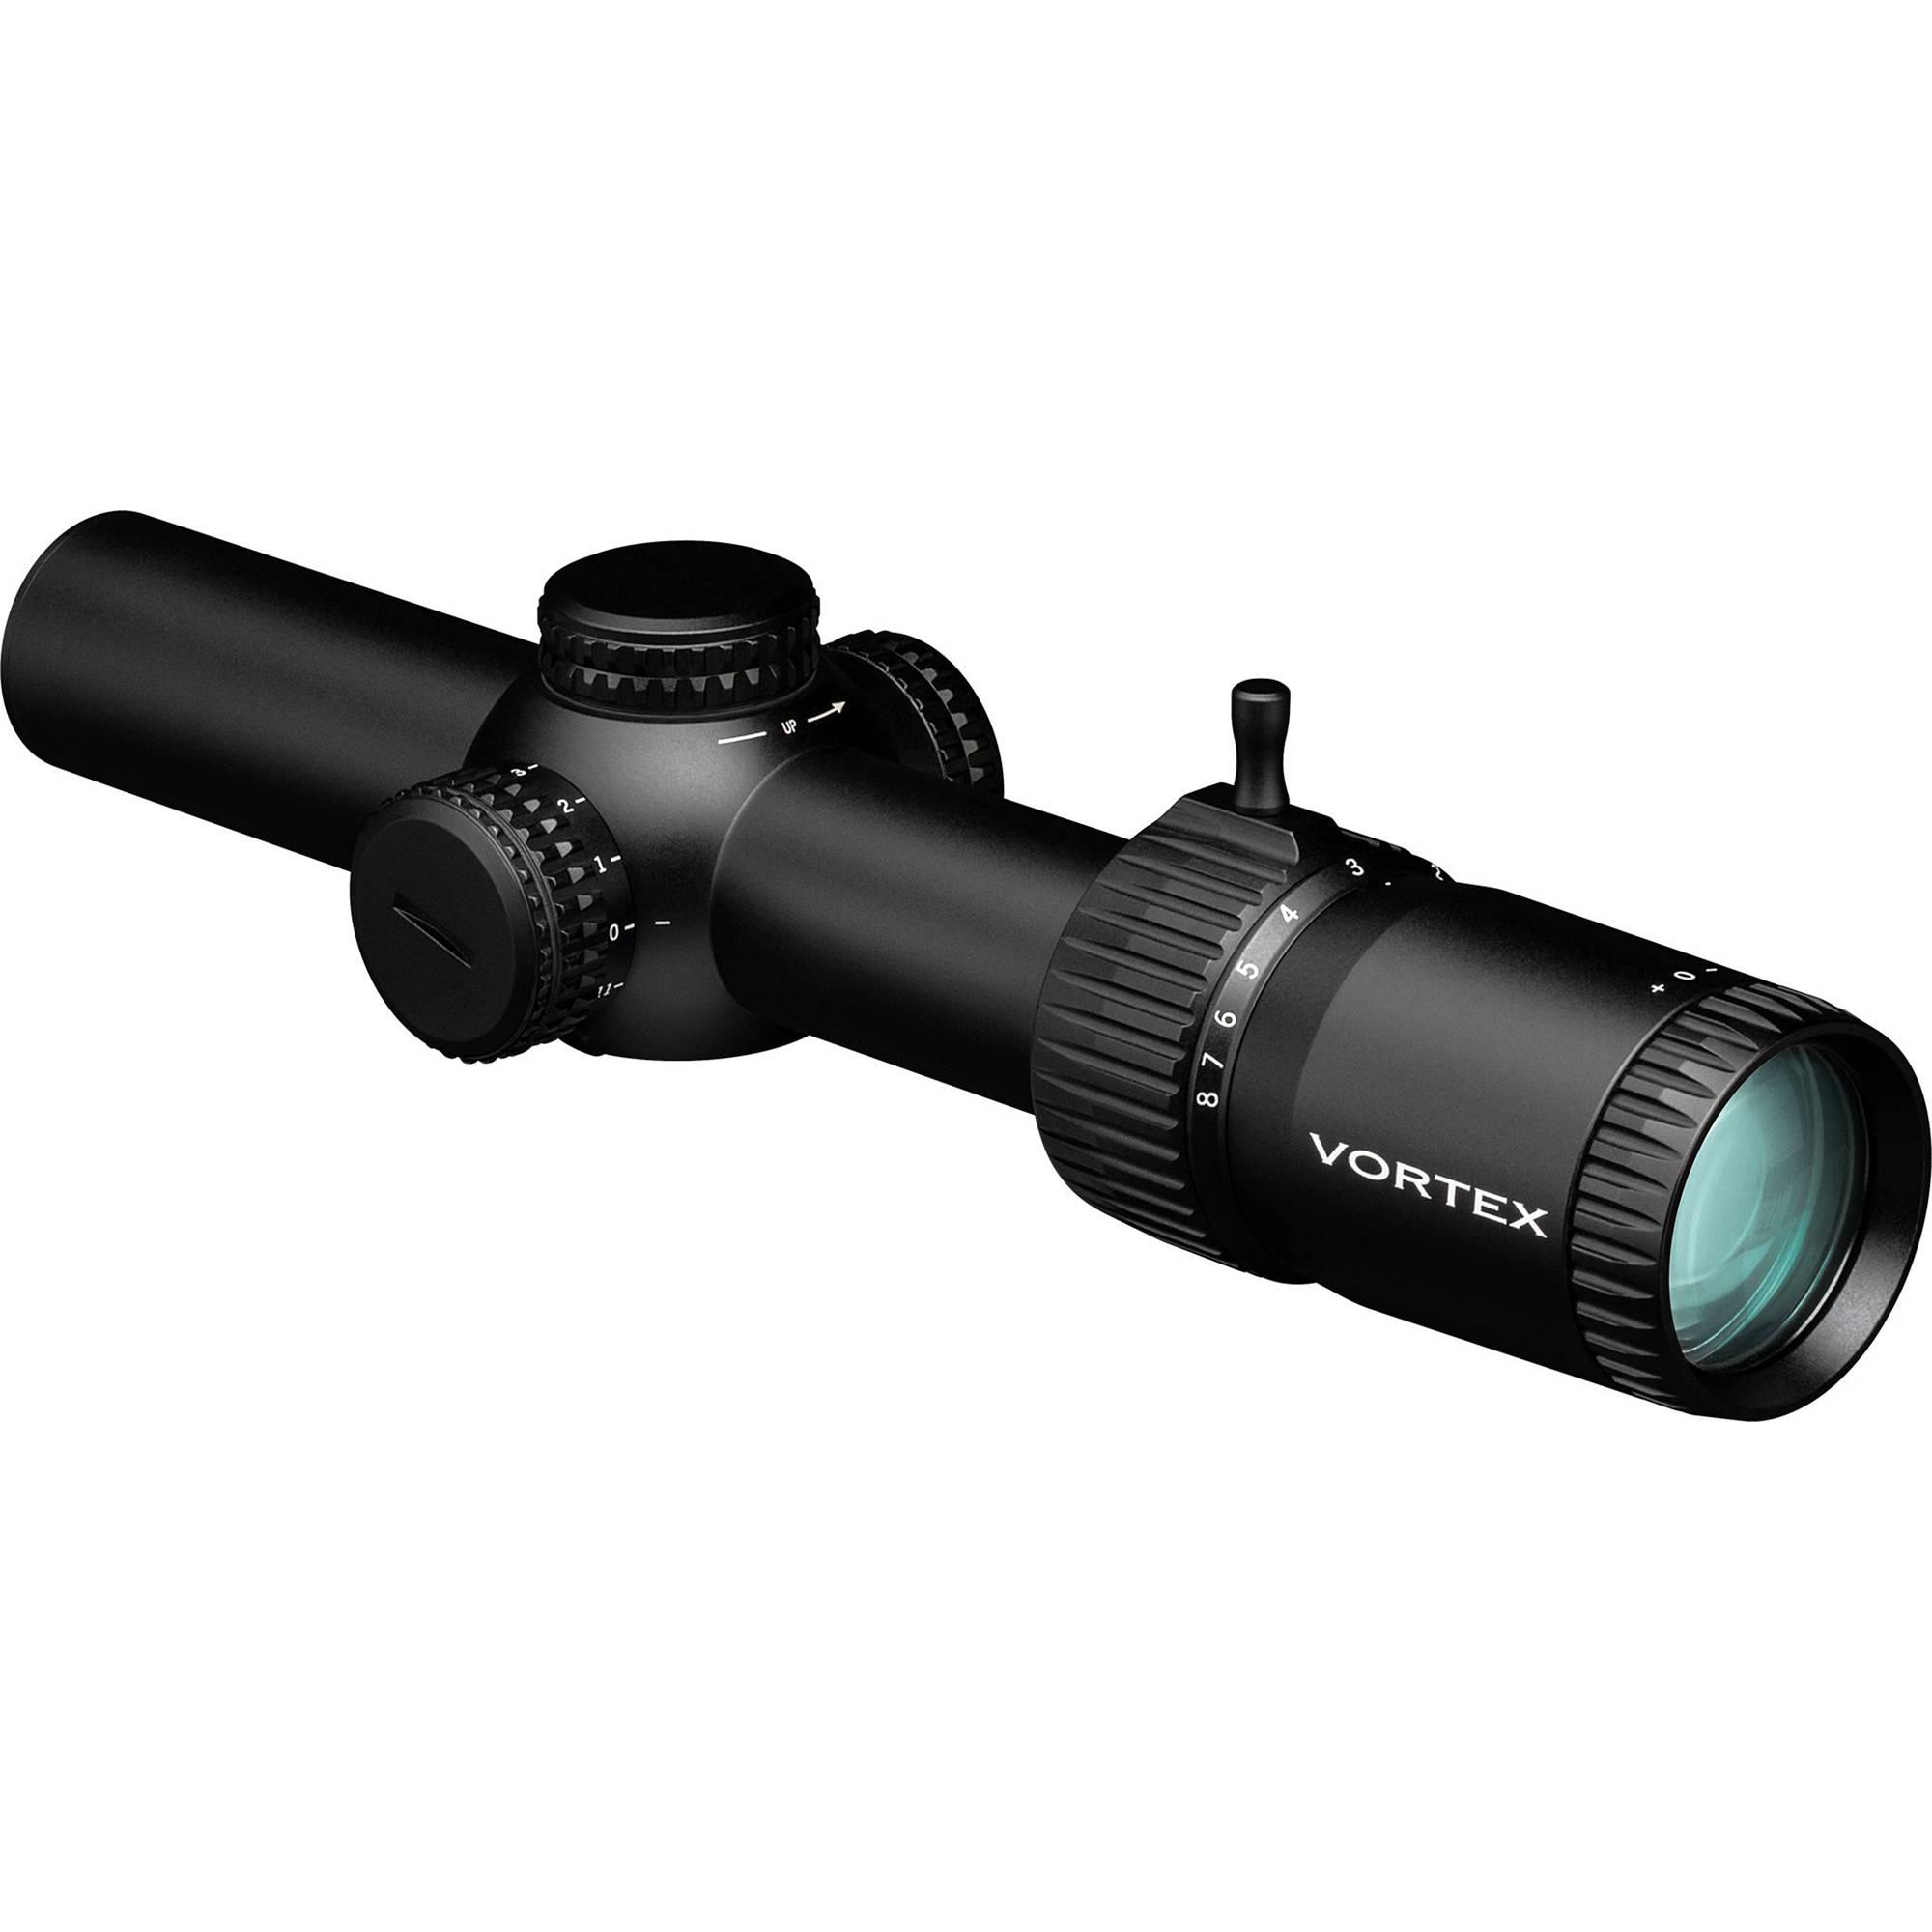 Riflescope-Vortex-Optics-Strike-Eagle-1-8x24-1